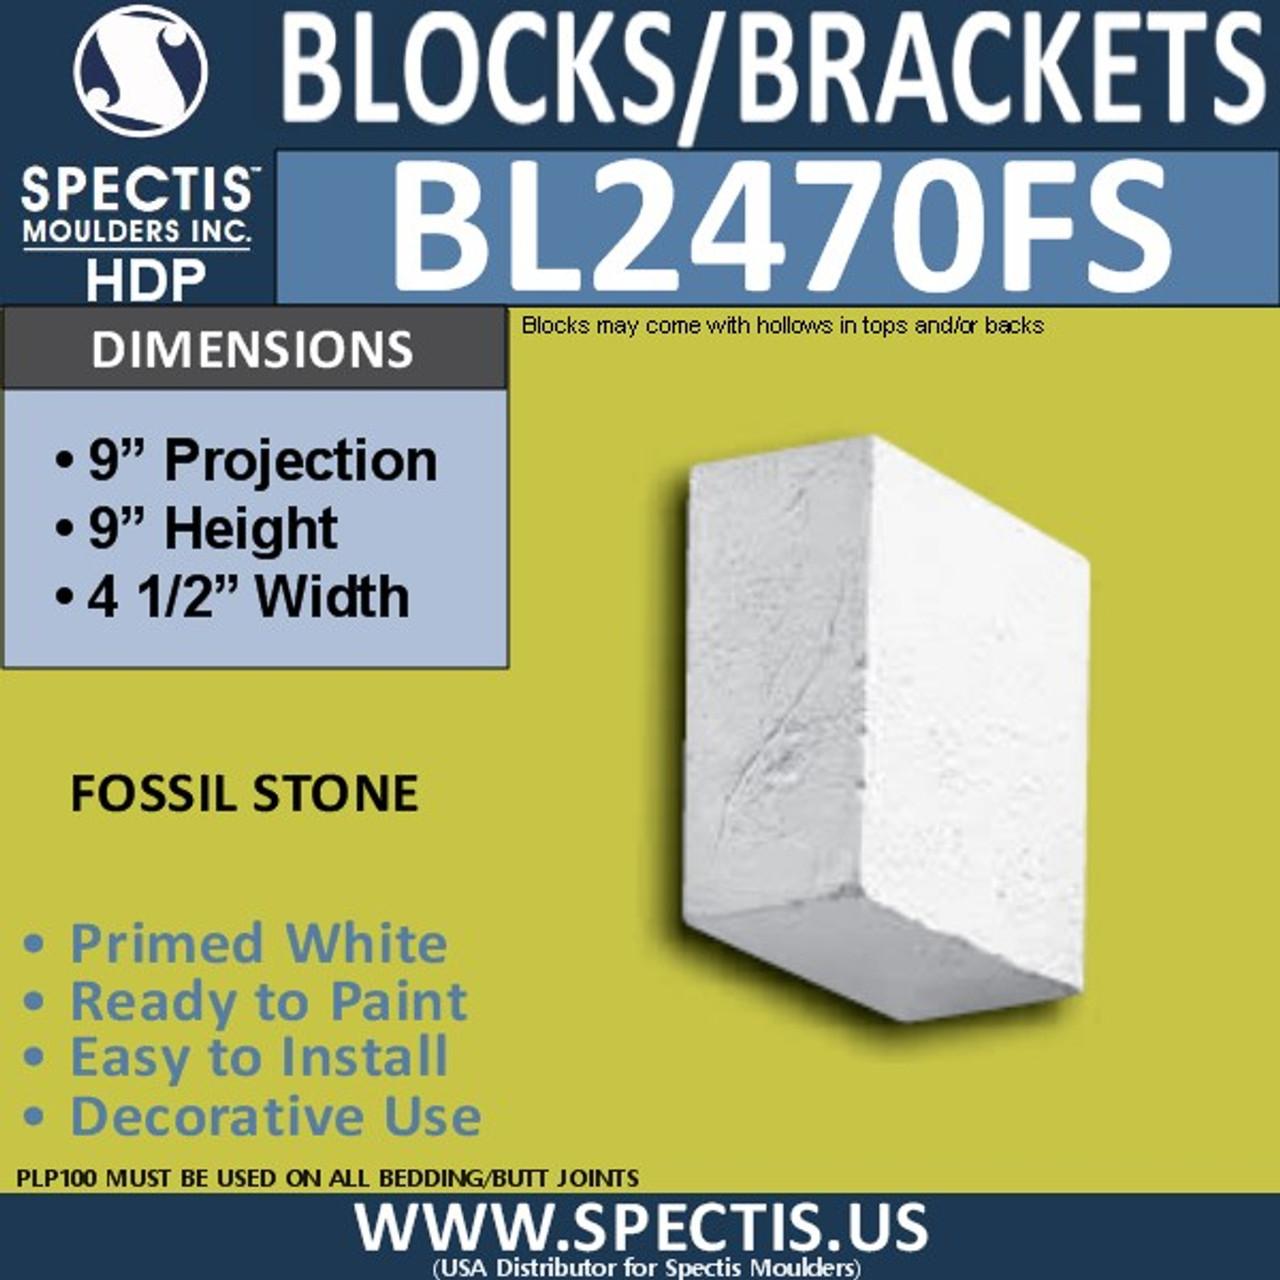 "BL2470FS Eave Block or Bracket 4.5""W x 9""H x 9"" P"